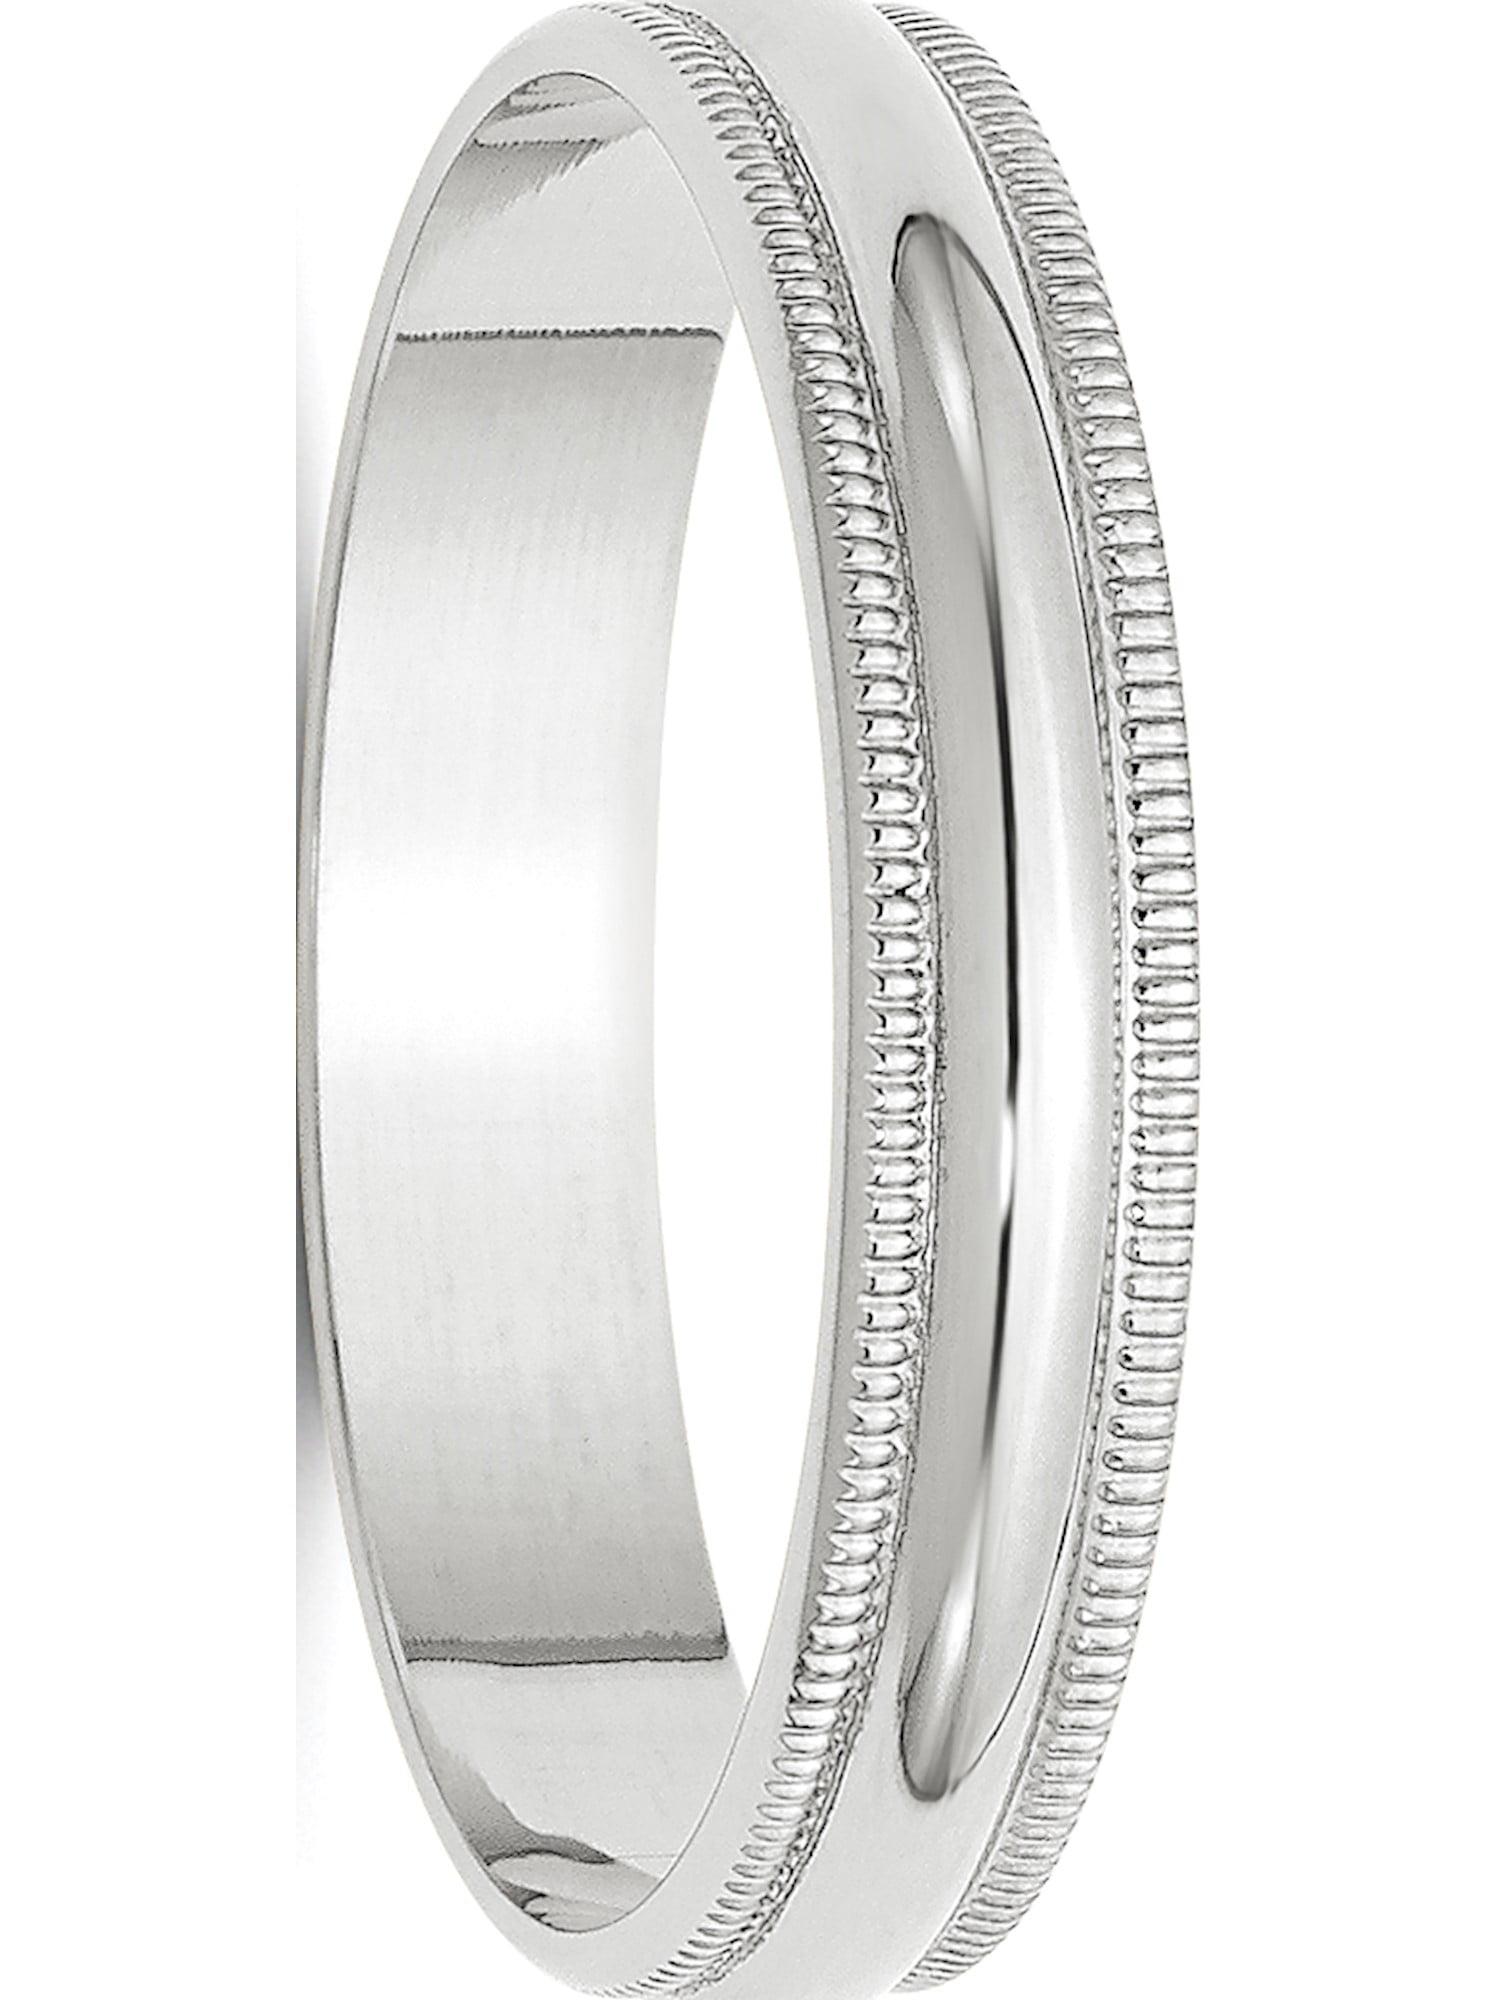 10K Yellow Gold 4mm Lightweight Milgrain Half Round Band Ring